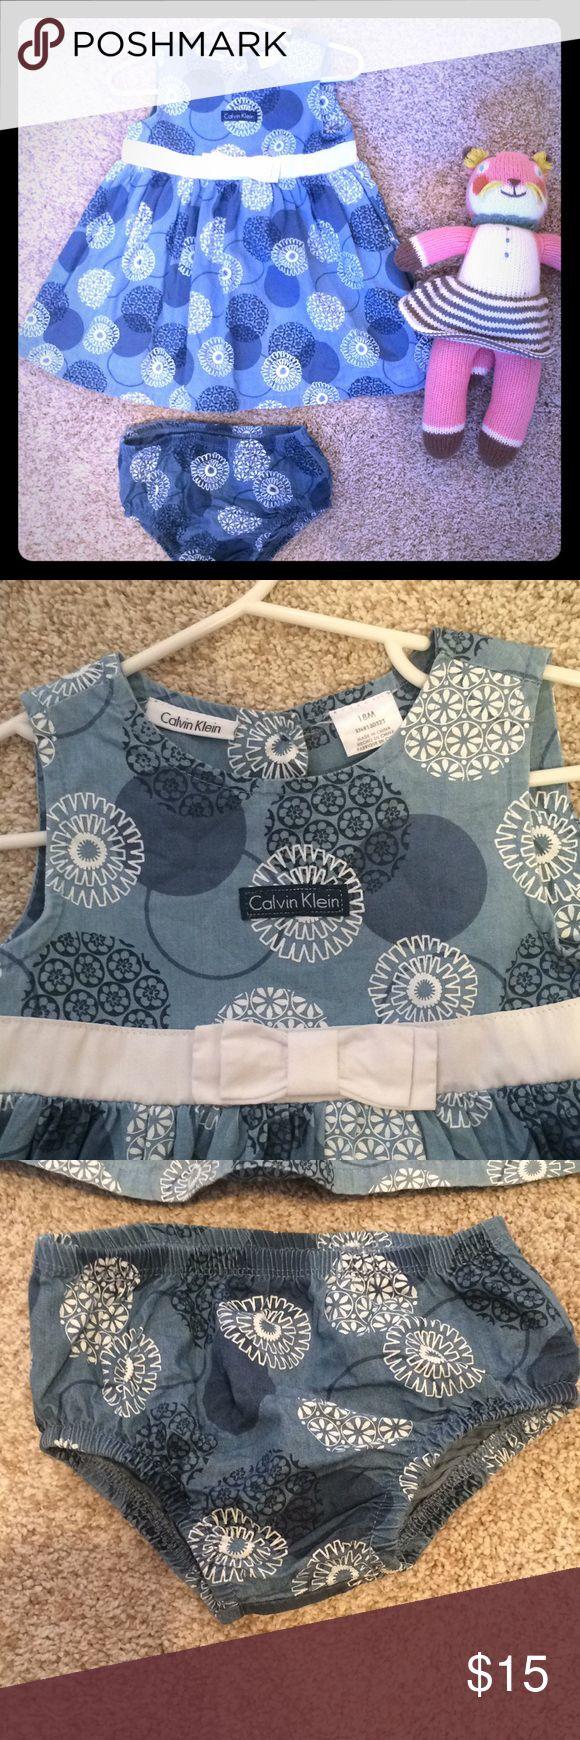 Calvin Klein little girls dress Worn twice .. like new condition!! Smoke free, good home. Calvin Klein Dresses Formal